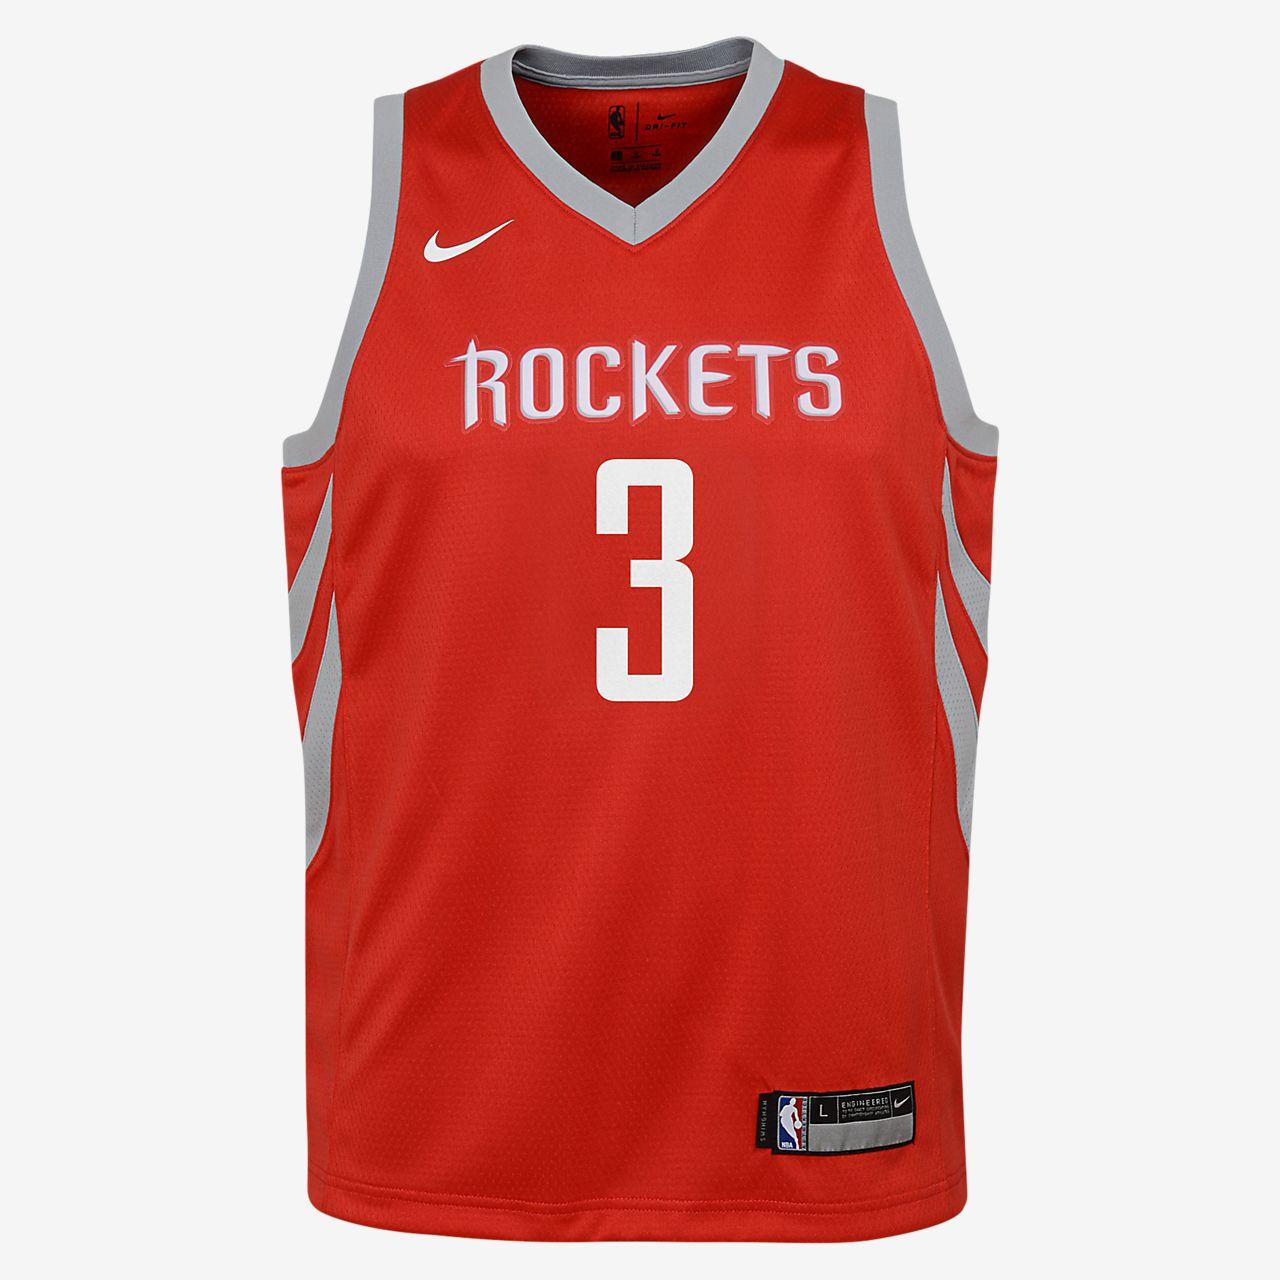 4fe4e61a6 ... chris paul houston rockets nike icon edition swingman big kids nba  jersey